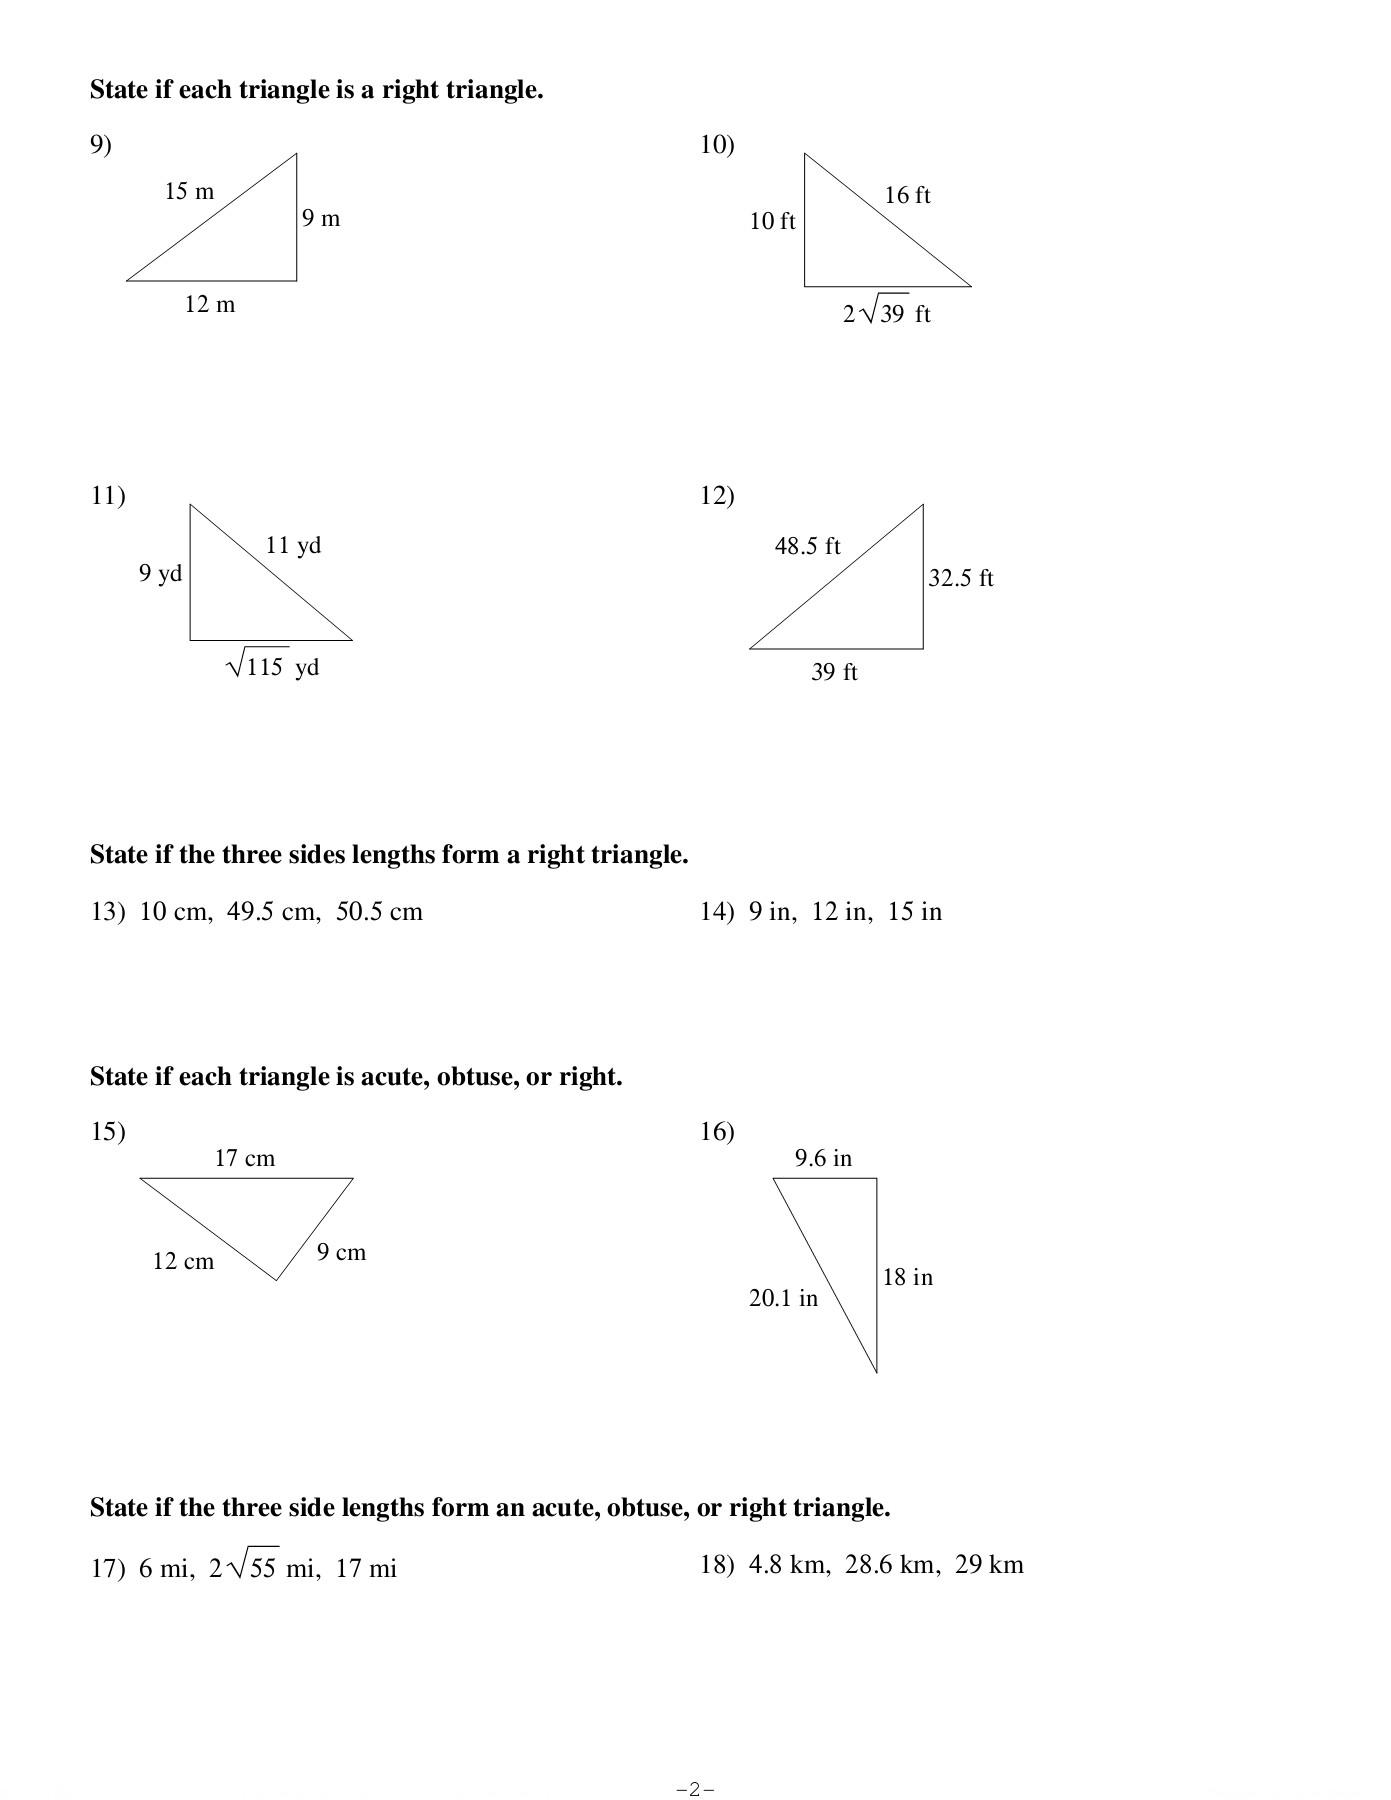 hight resolution of فوضوي الصبر فارغة the pythagorean theorem and its converse answers -  pleasantgroveumc.net